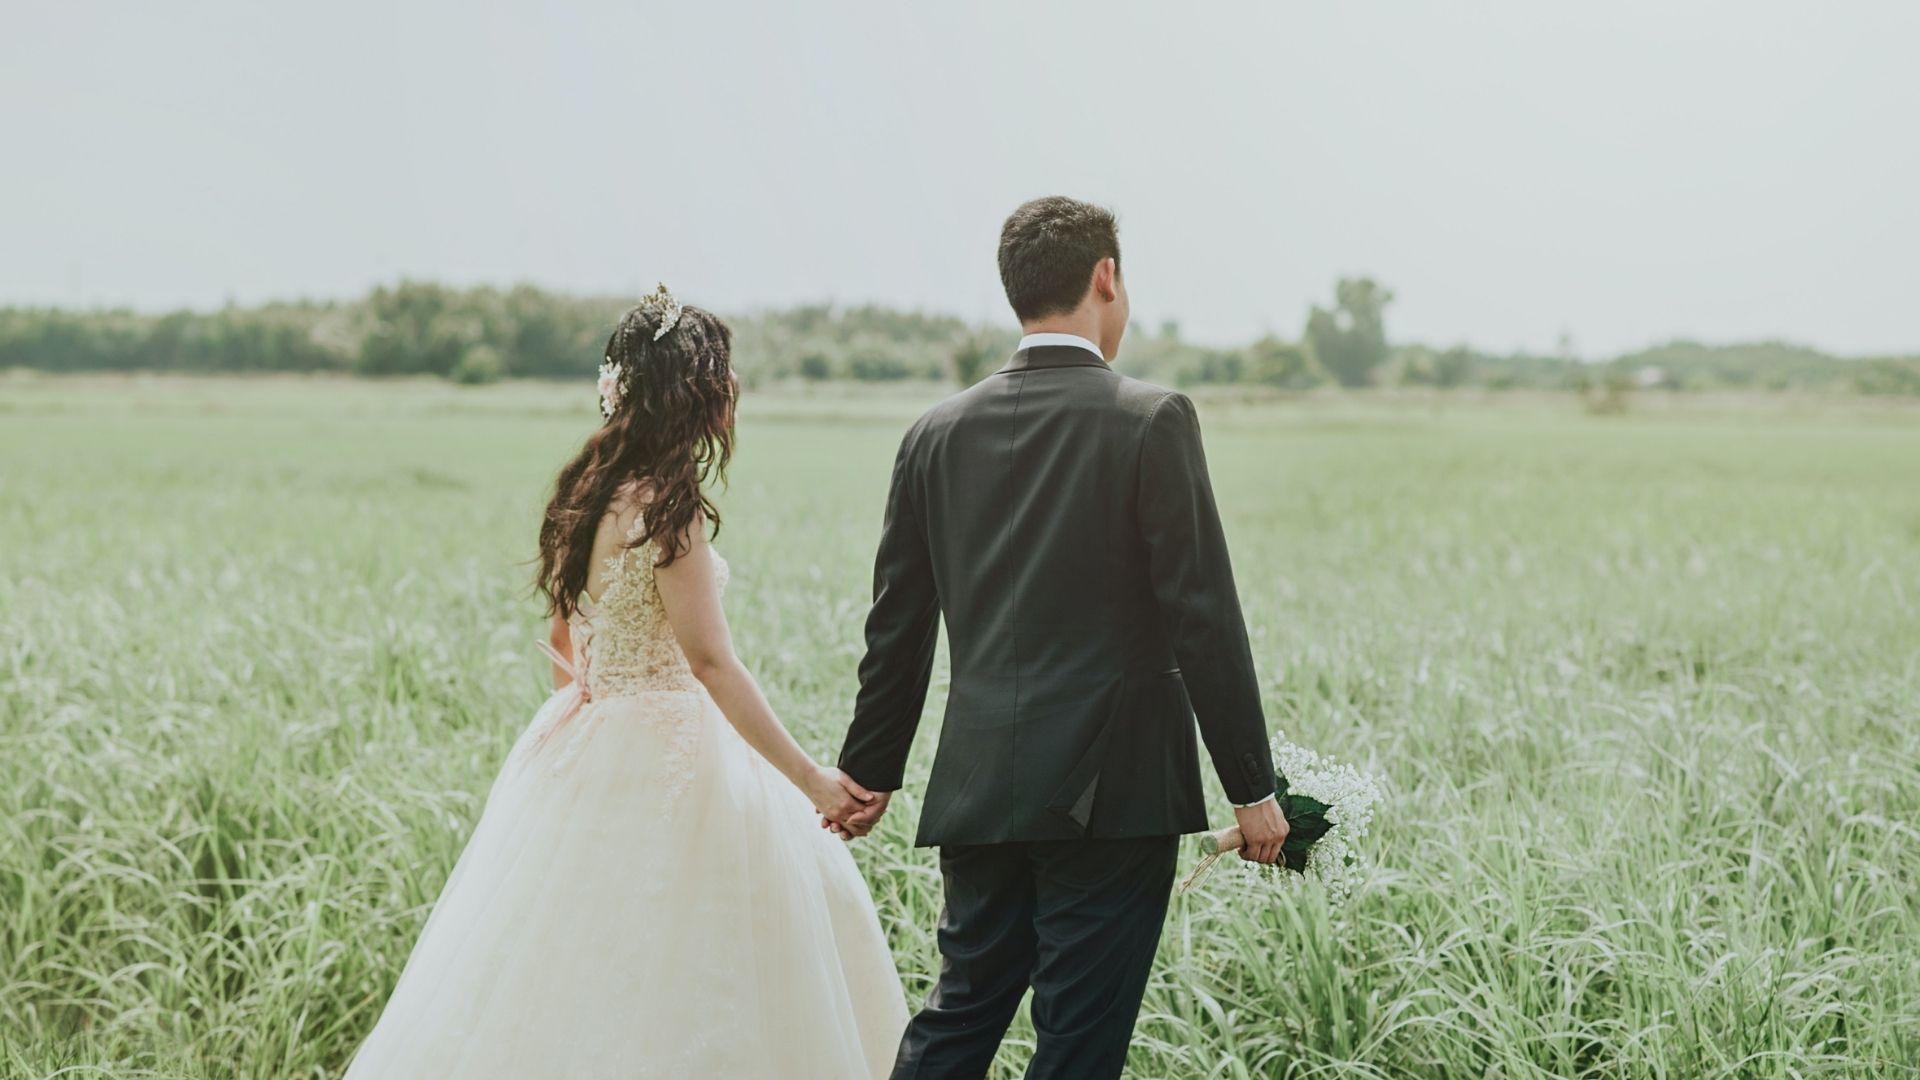 Les mariés se tiennent la main à Quimper